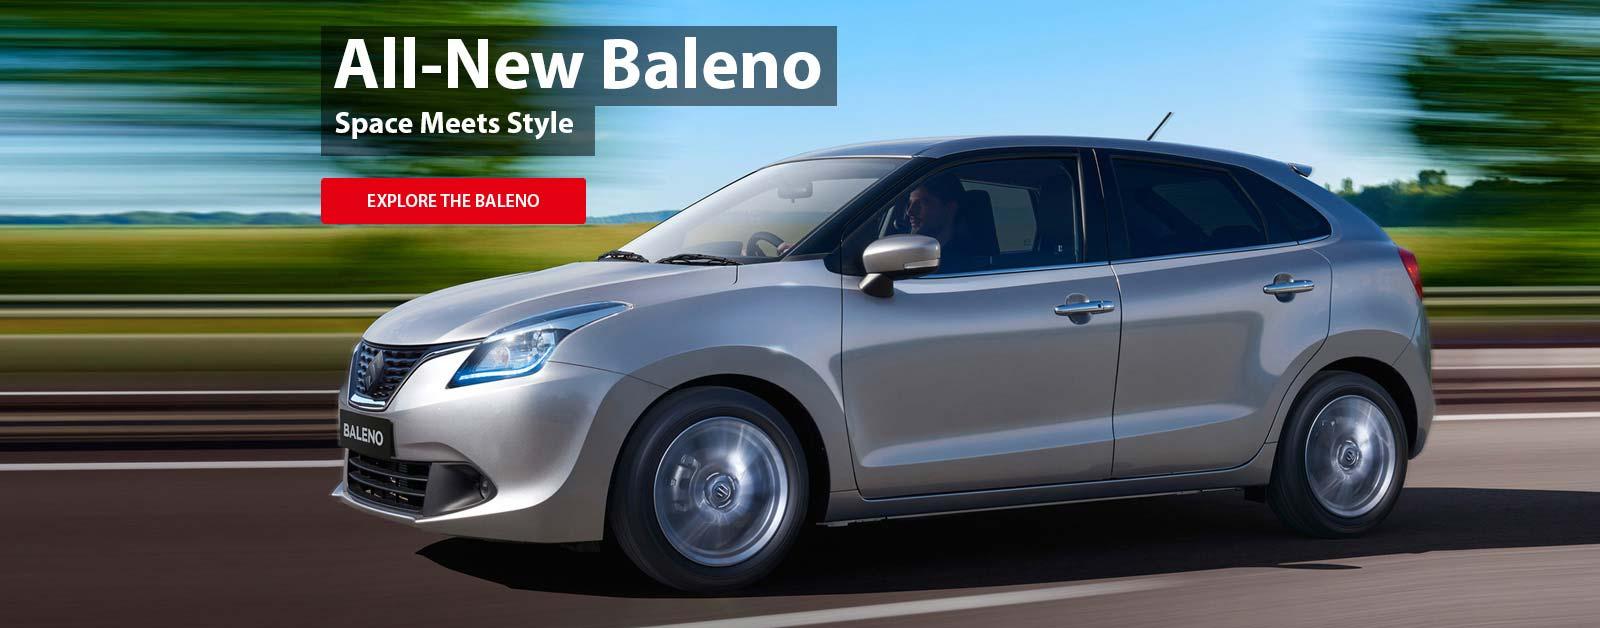 All-new Suzuki Baleno hatch, where space meets style. Explore the Baleno at Redcliffe Suzuki Brisbane.